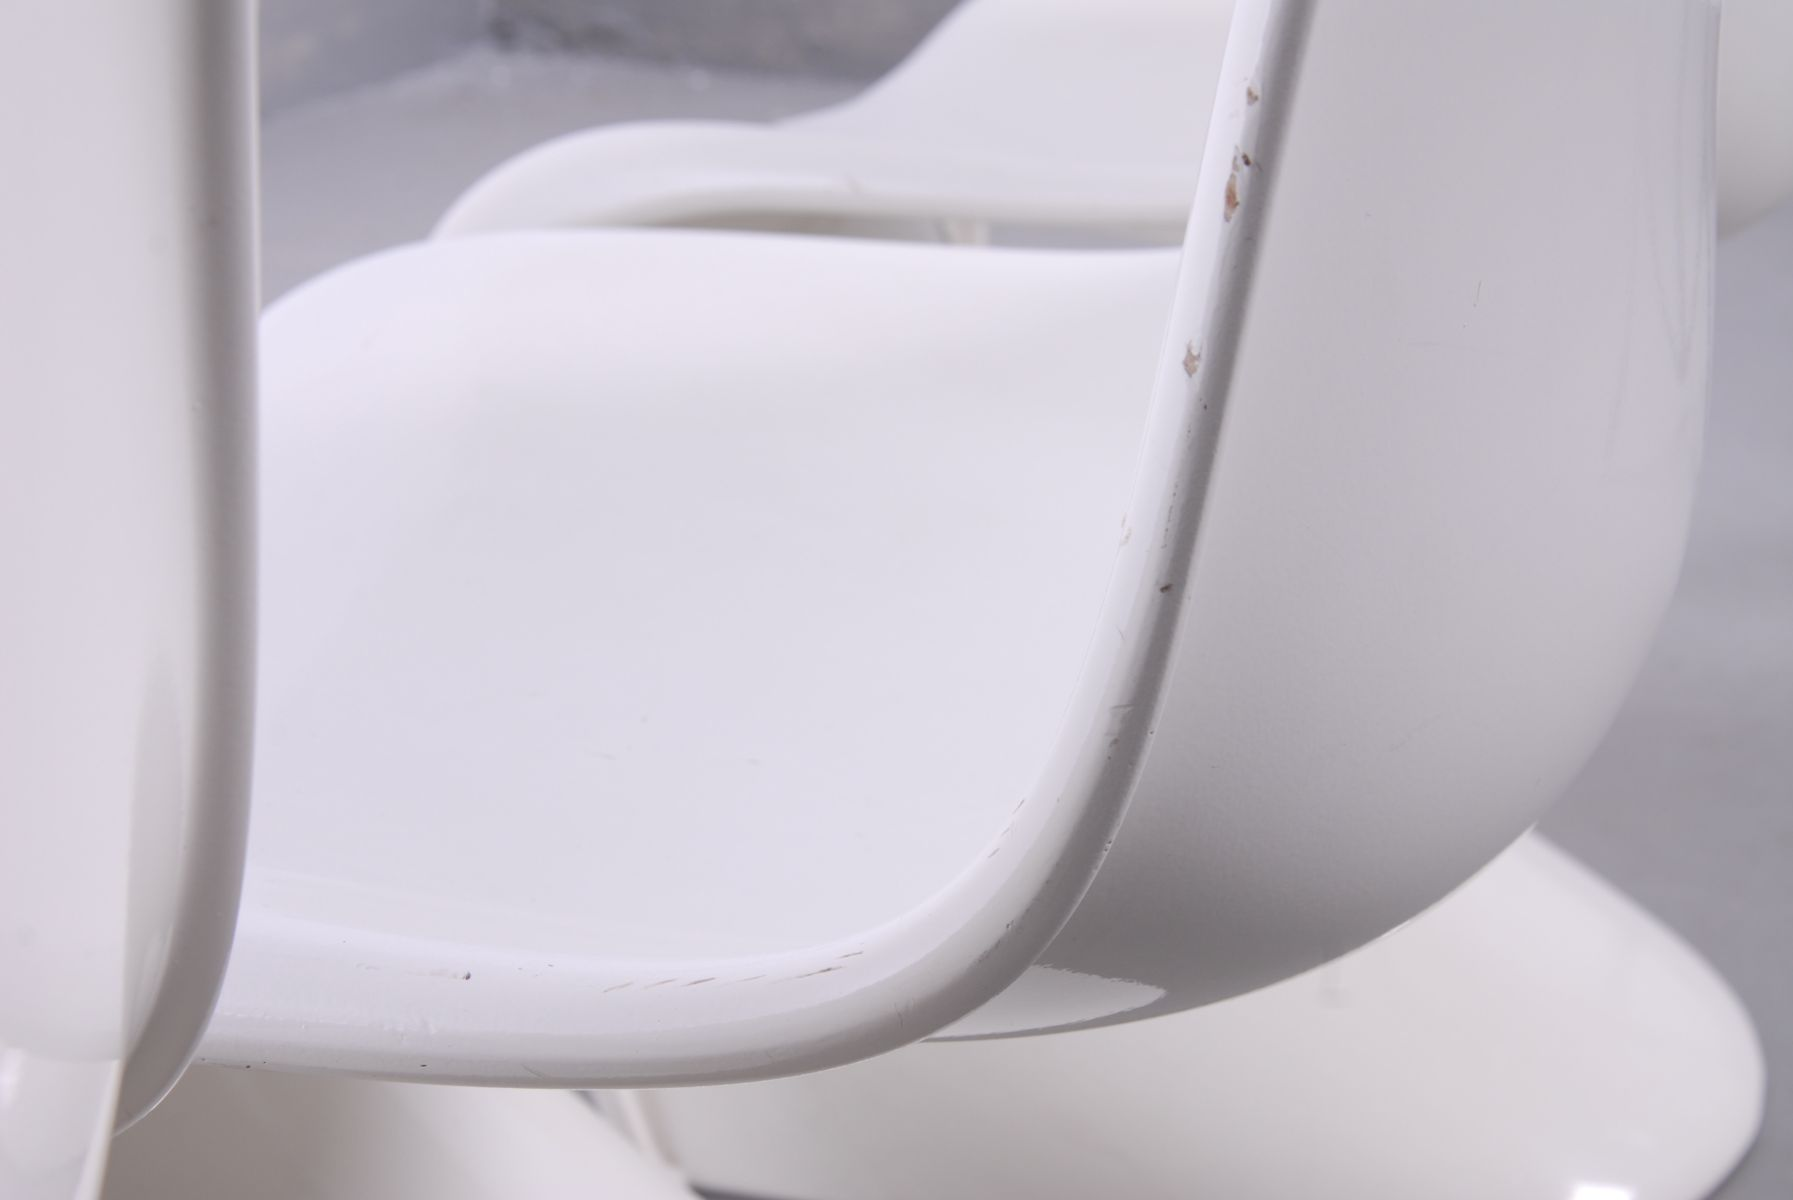 cremefarbene panton chairs von verner panton f r fehlbaum 1960er 4er set bei pamono kaufen. Black Bedroom Furniture Sets. Home Design Ideas